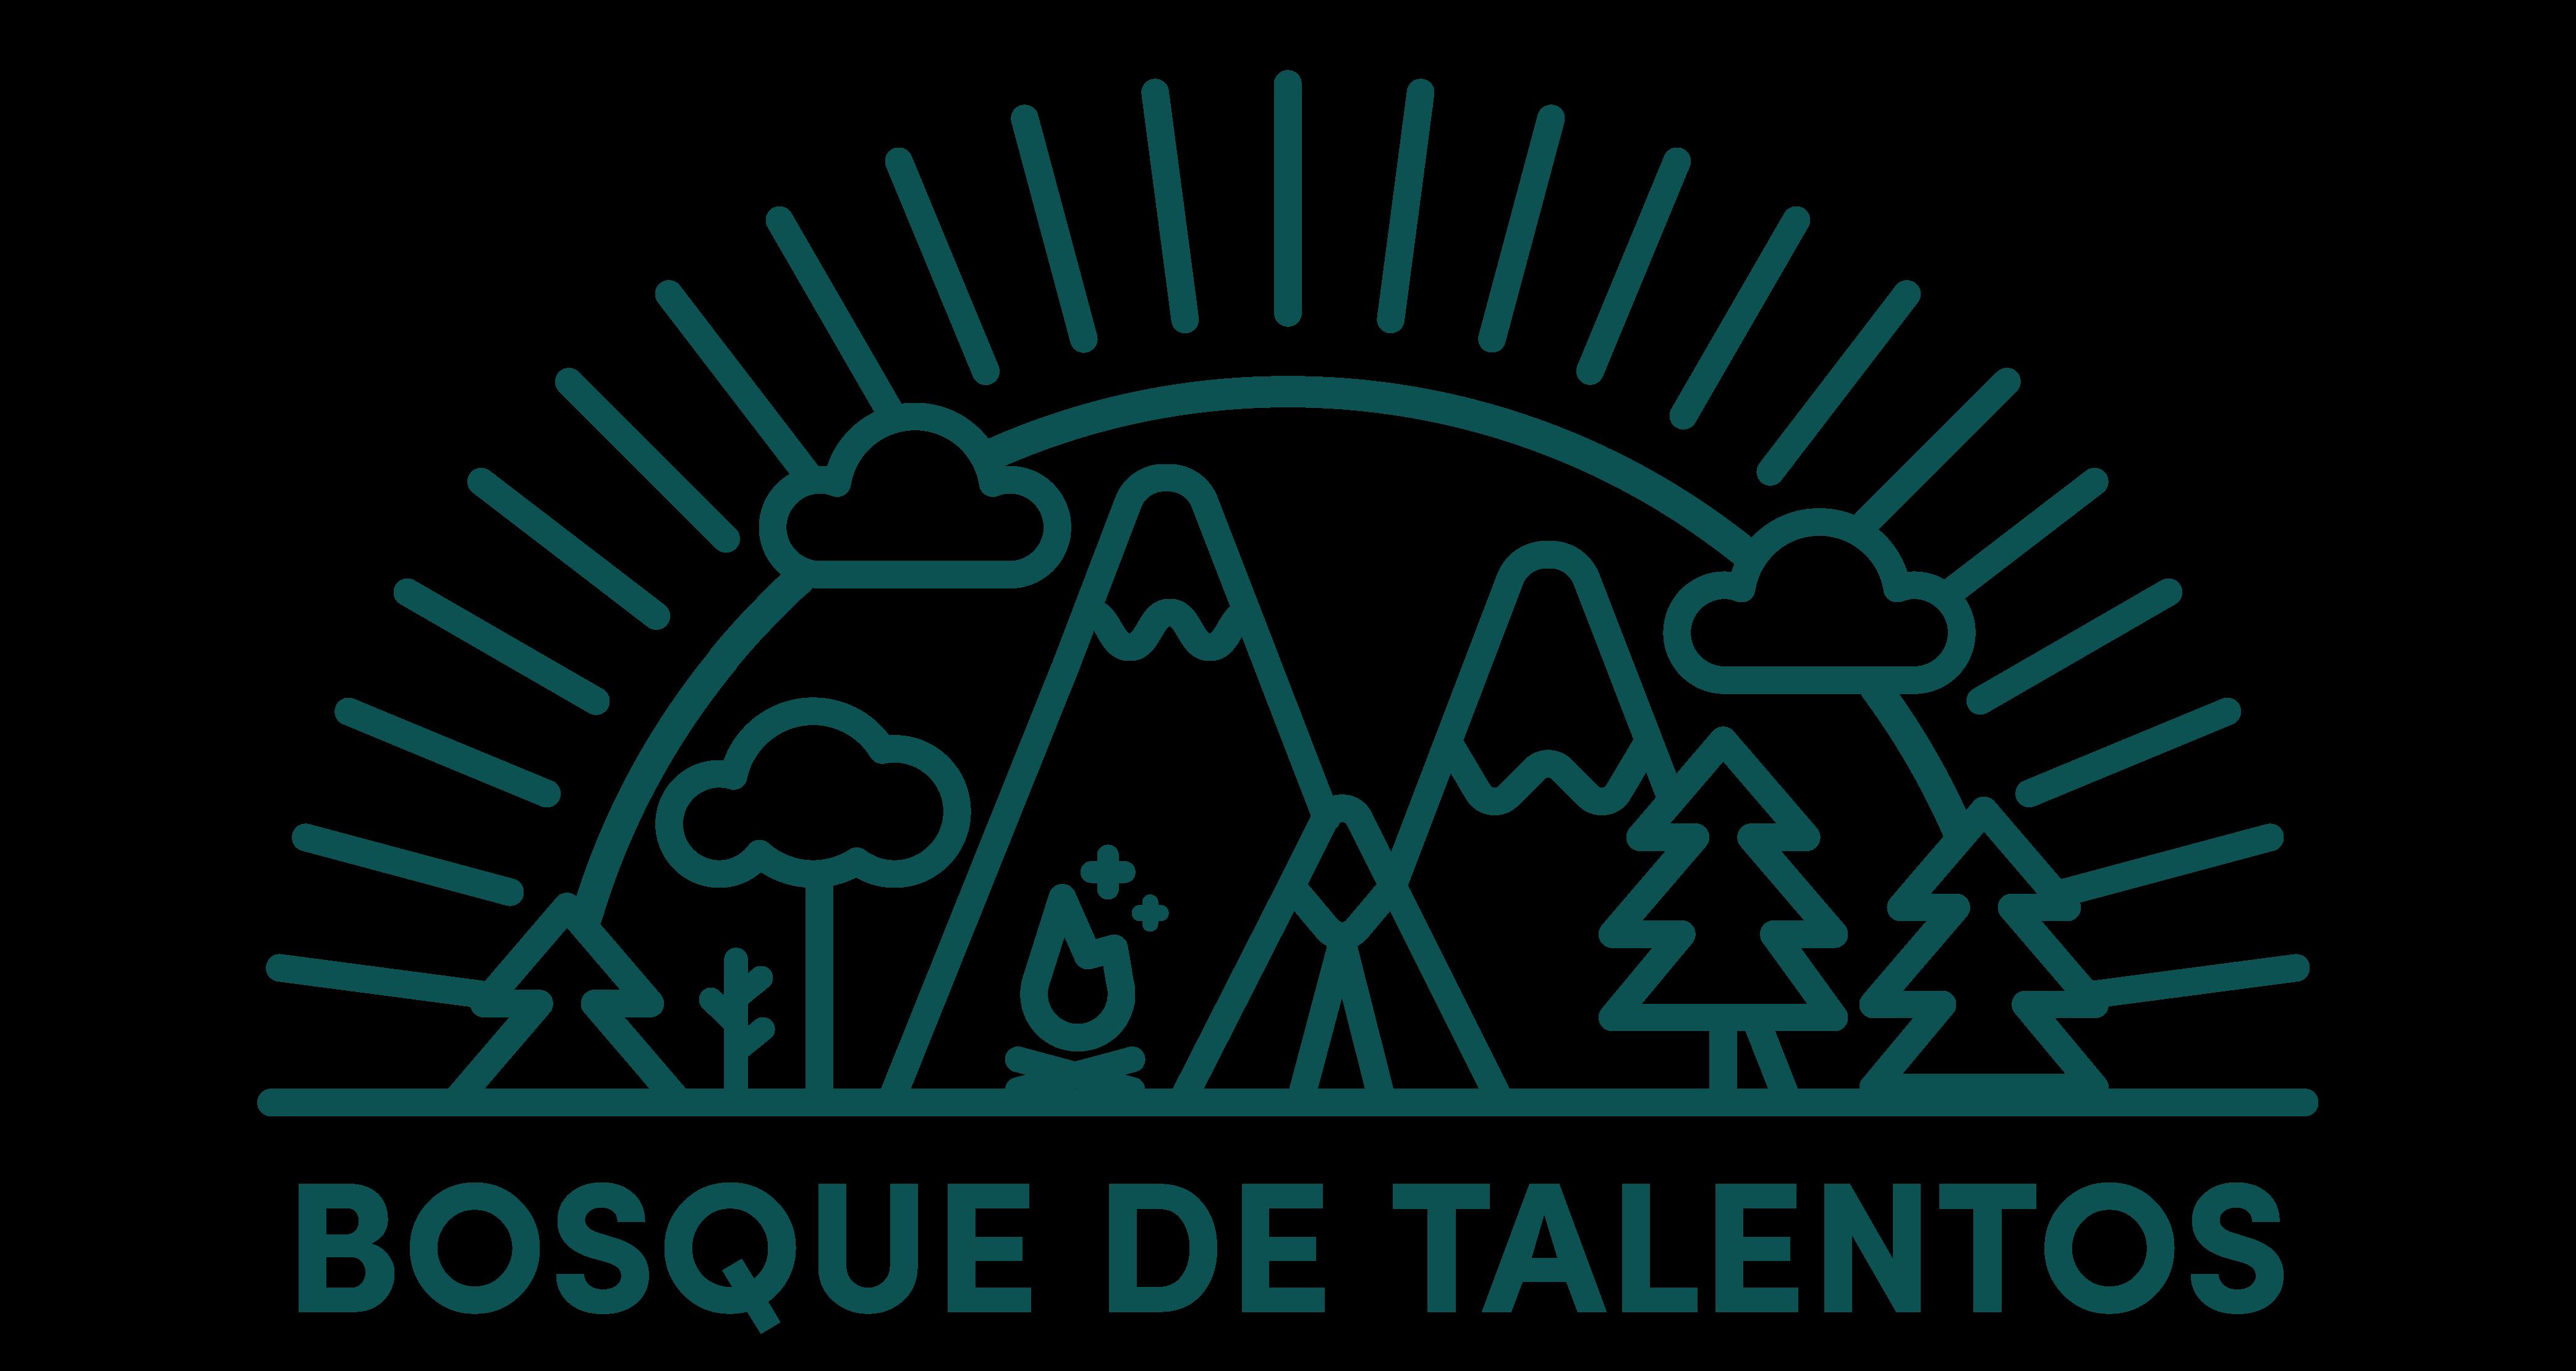 Bosque de Talentos